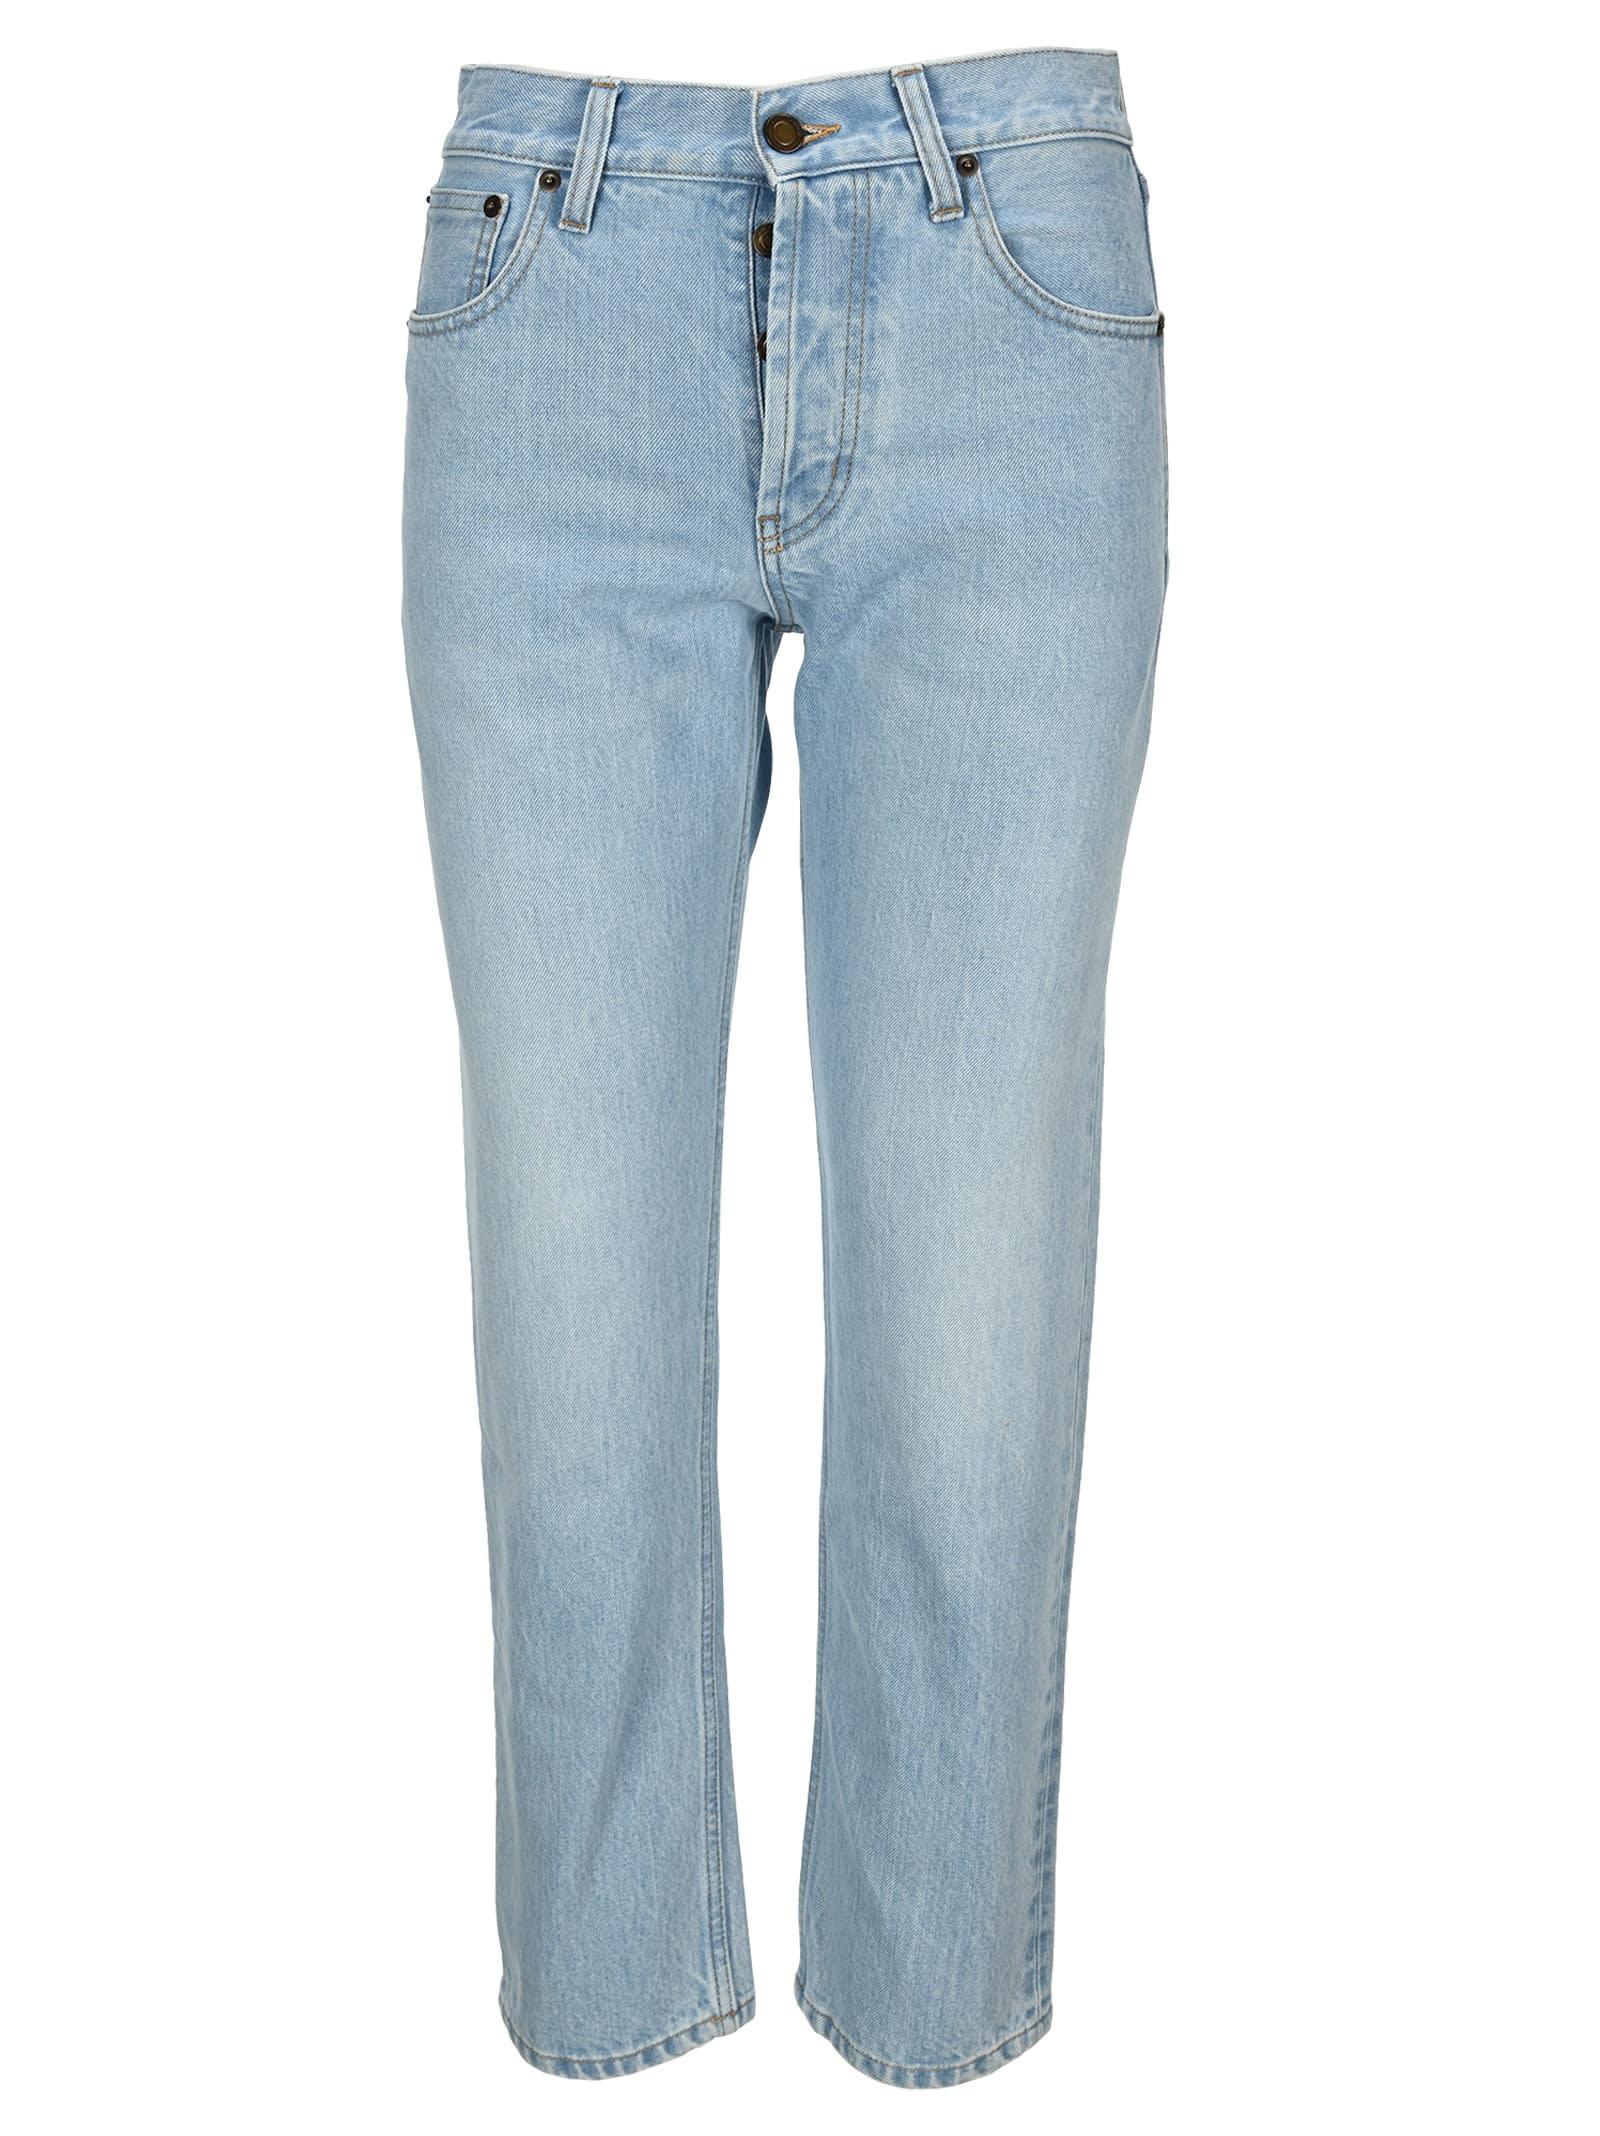 Saint Laurent Faded Straight-leg Jeans In Basic Blue